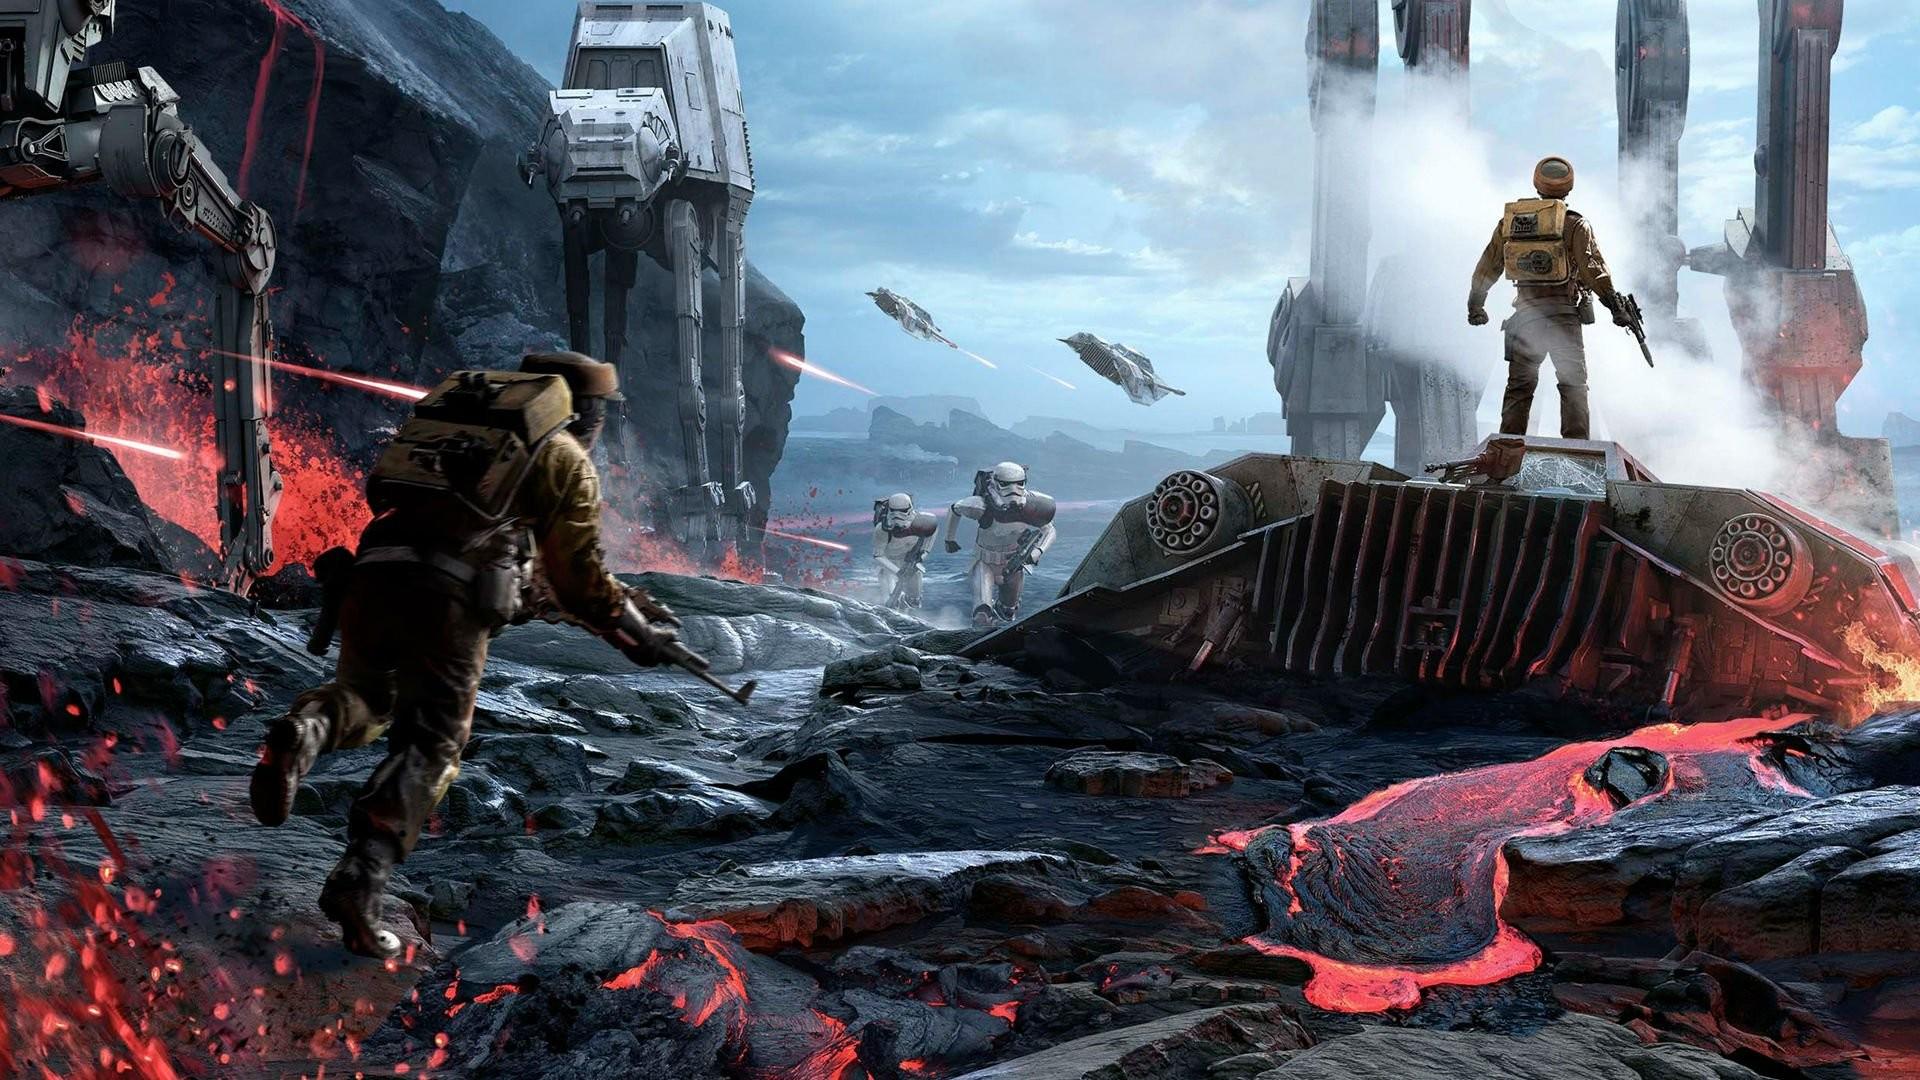 Star Wars Battlefront Wallpaper – Dr. Odd